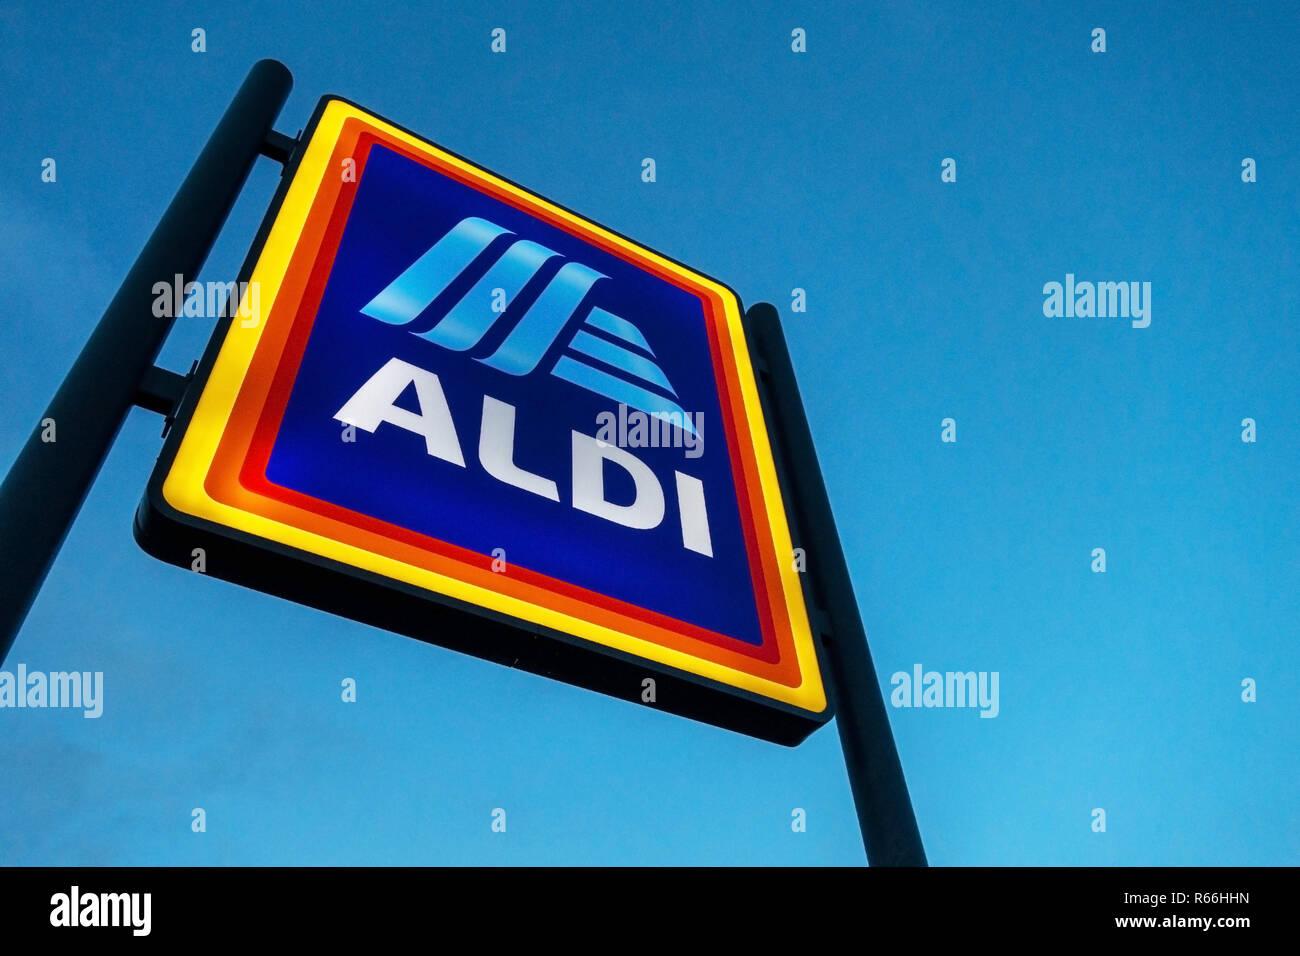 illuminated Aldi Sign at dusk in Dinnington, Rotherham UK - Stock Image